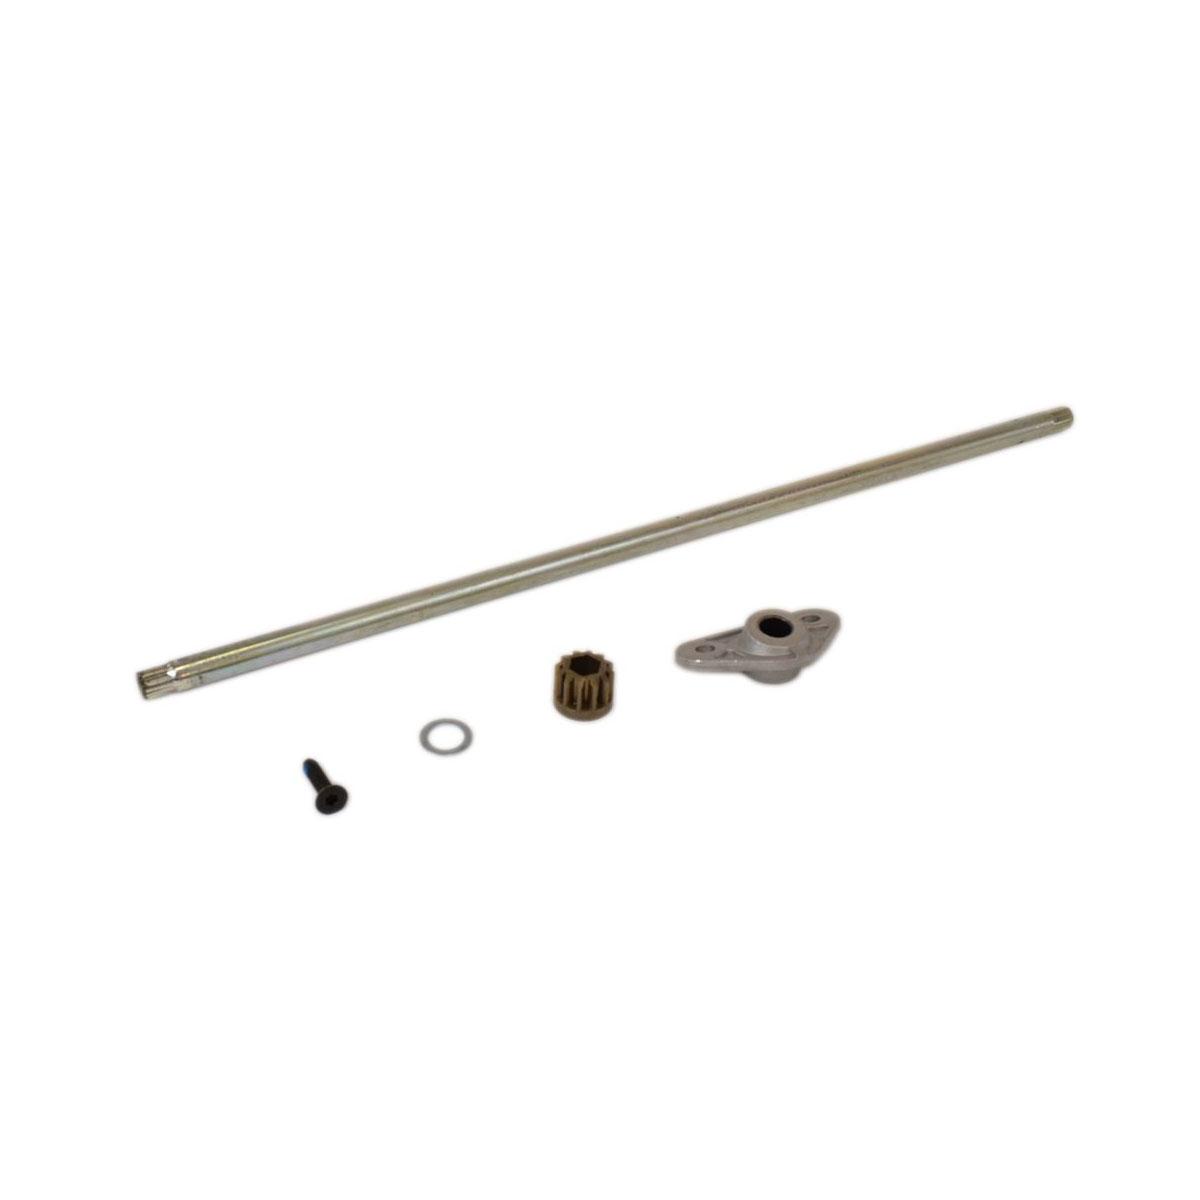 Husqvarna Kit SRVC Steering Shaft 3HISHFT 587738903